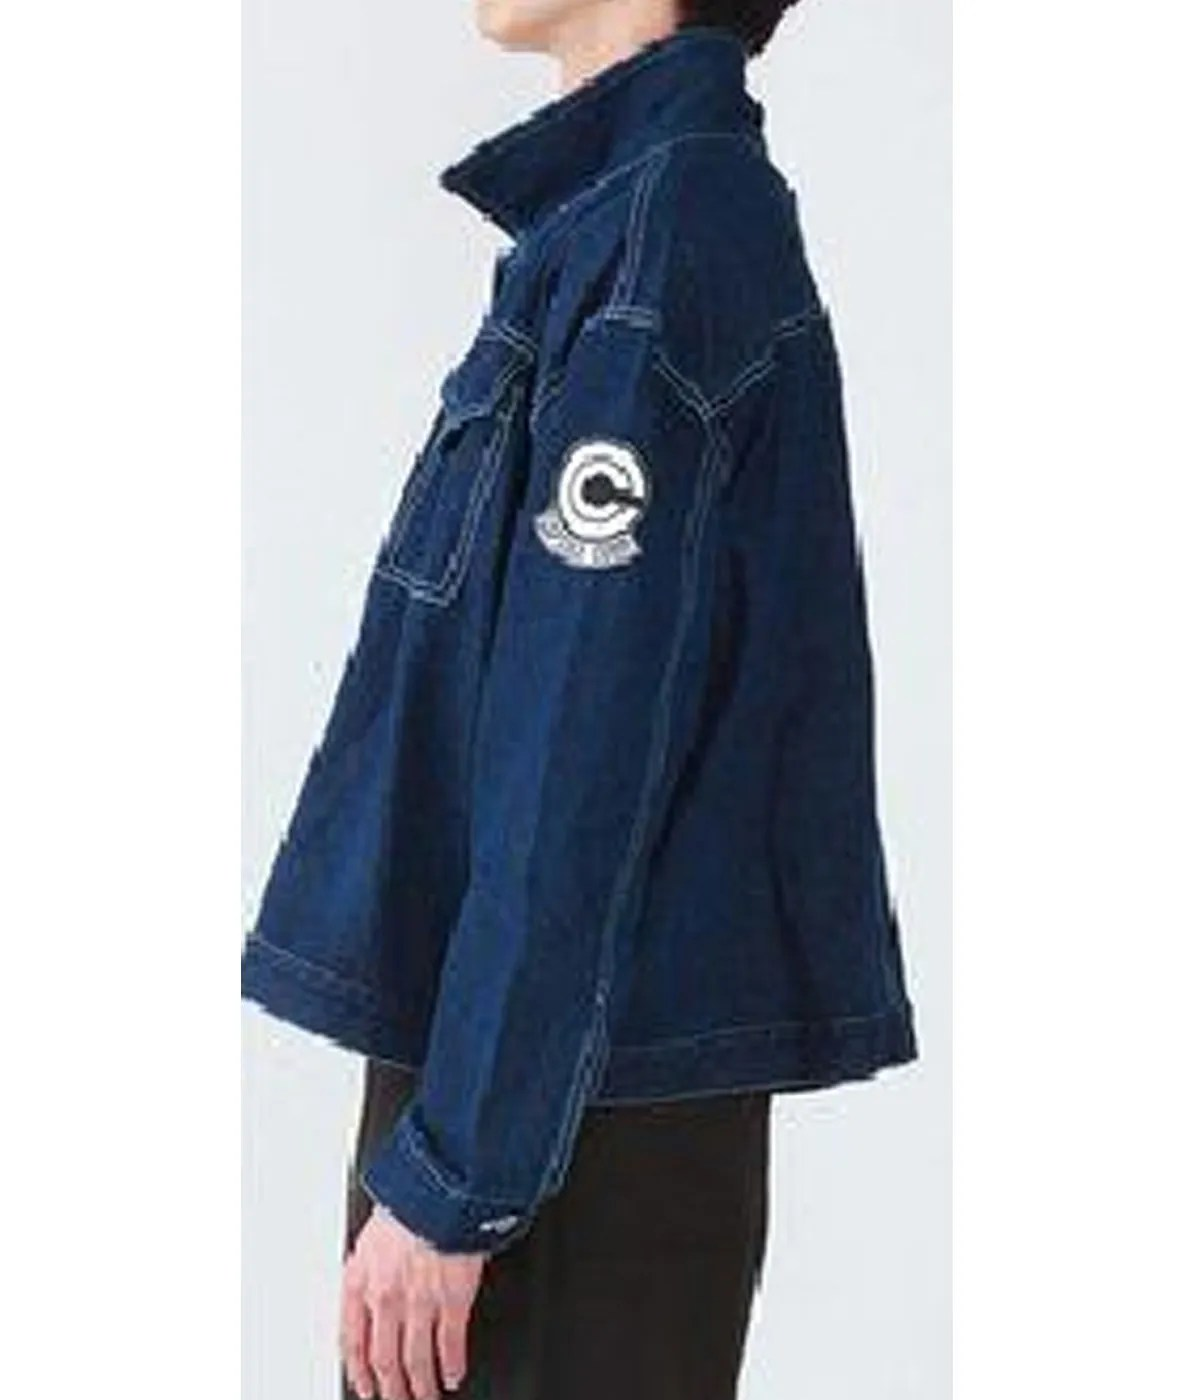 future-trunks-dragon-ball-jacket